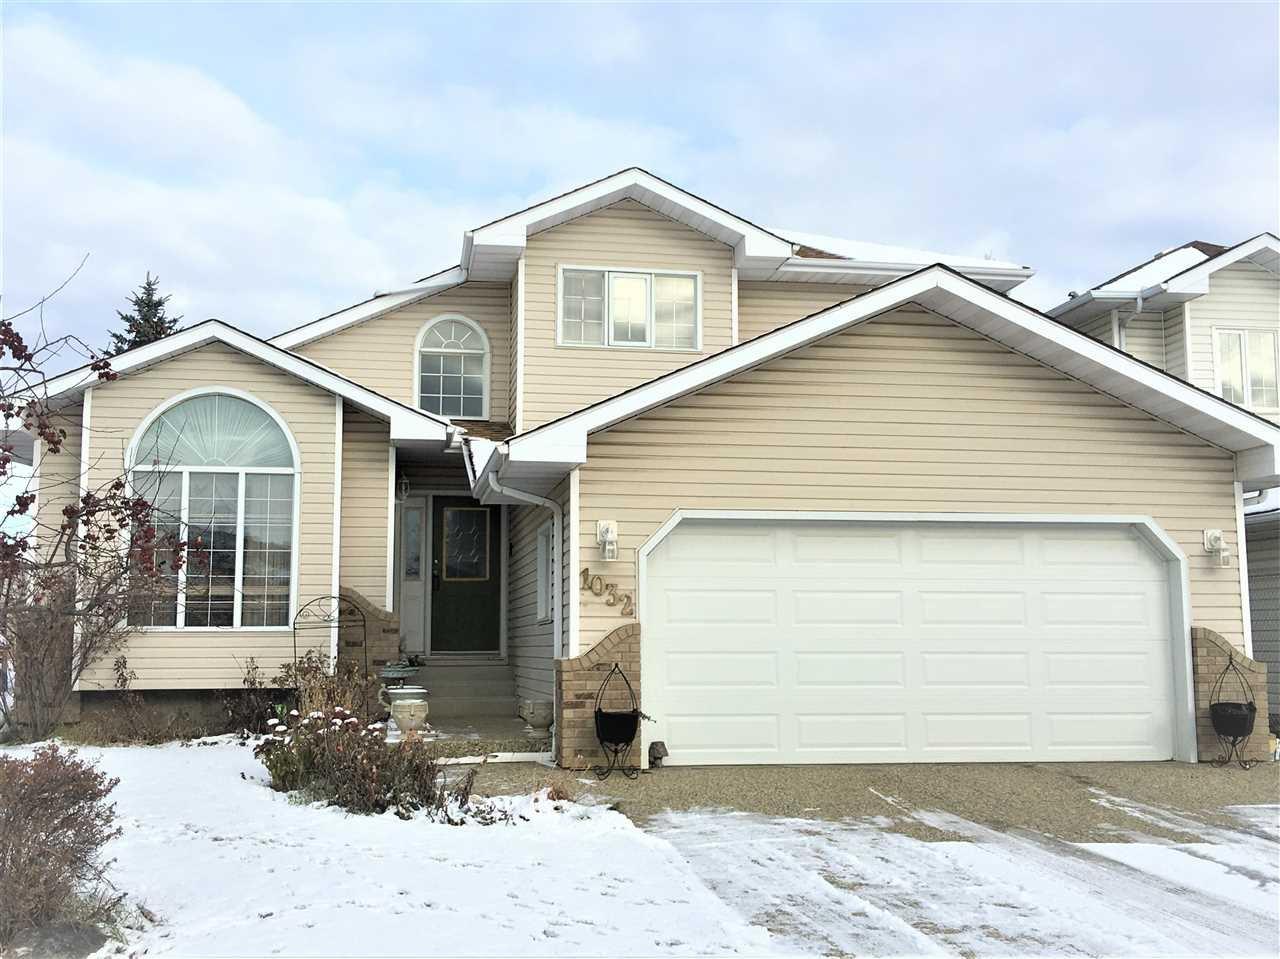 Main Photo: 1032 JAMES Crescent in Edmonton: Zone 29 House for sale : MLS®# E4171193